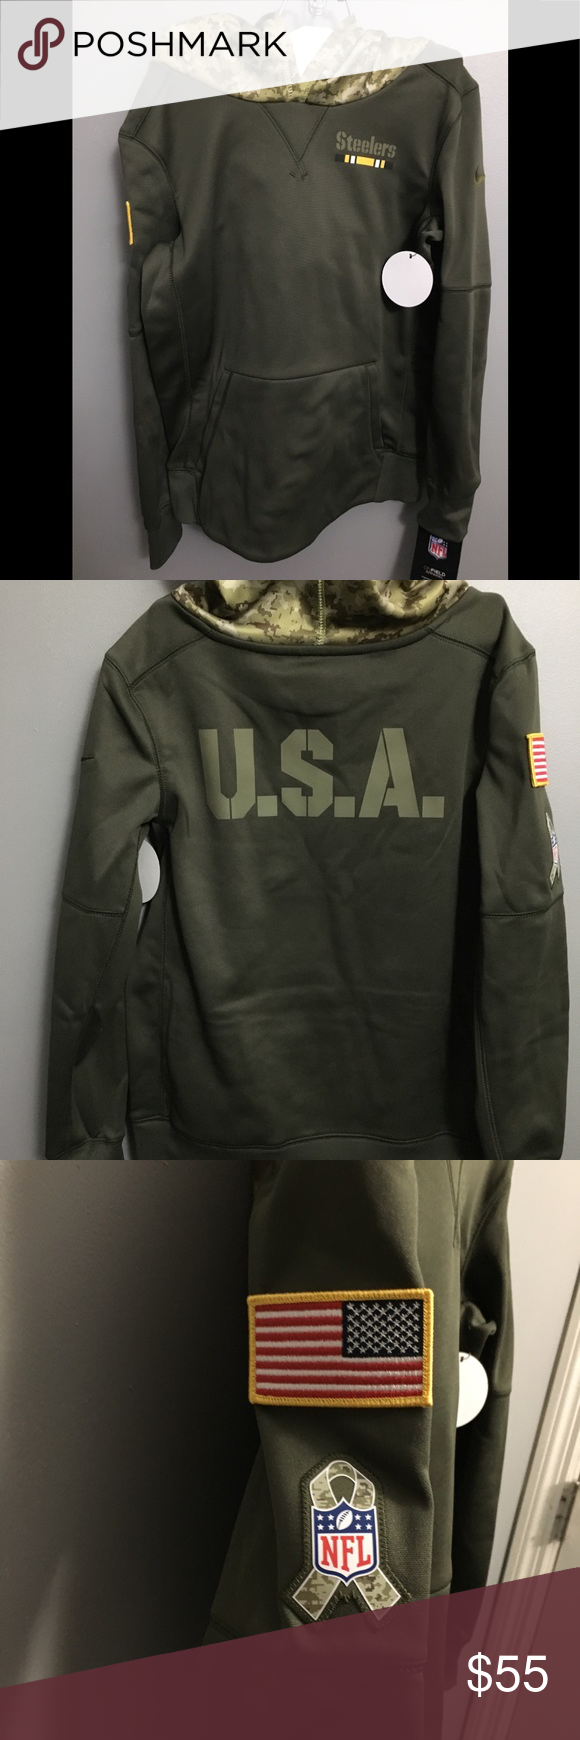 wholesale dealer adff8 81505 Steelers boys Nike therma hoodie Boys Nike therma hoodie ...